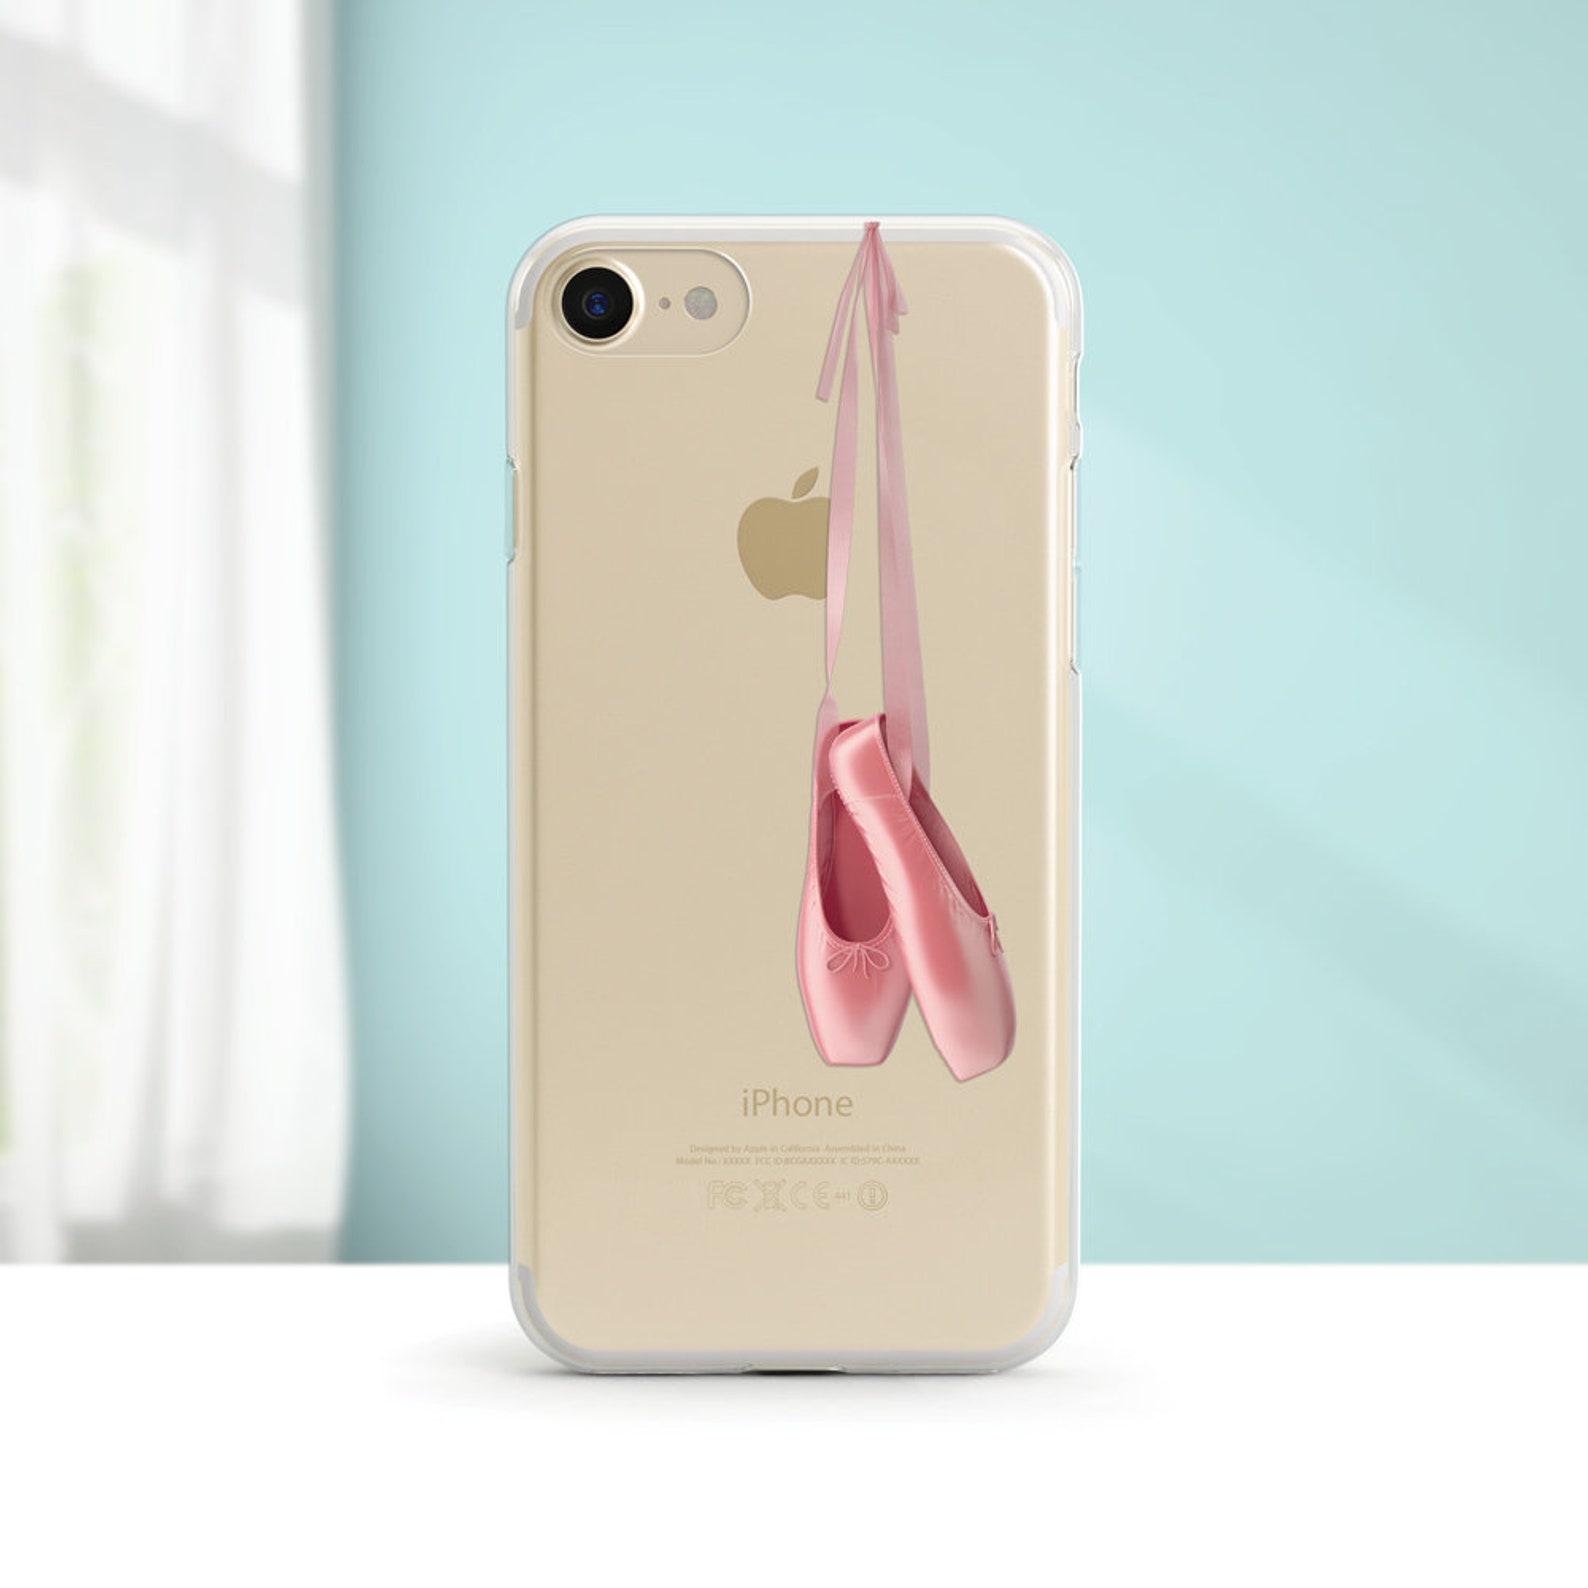 ballet, pointe shoe, clear soft phone case, iphone xs max, iphone xr, iphone 8, iphone 7, iphone 7 plus, iphone 6, iphone se, sa